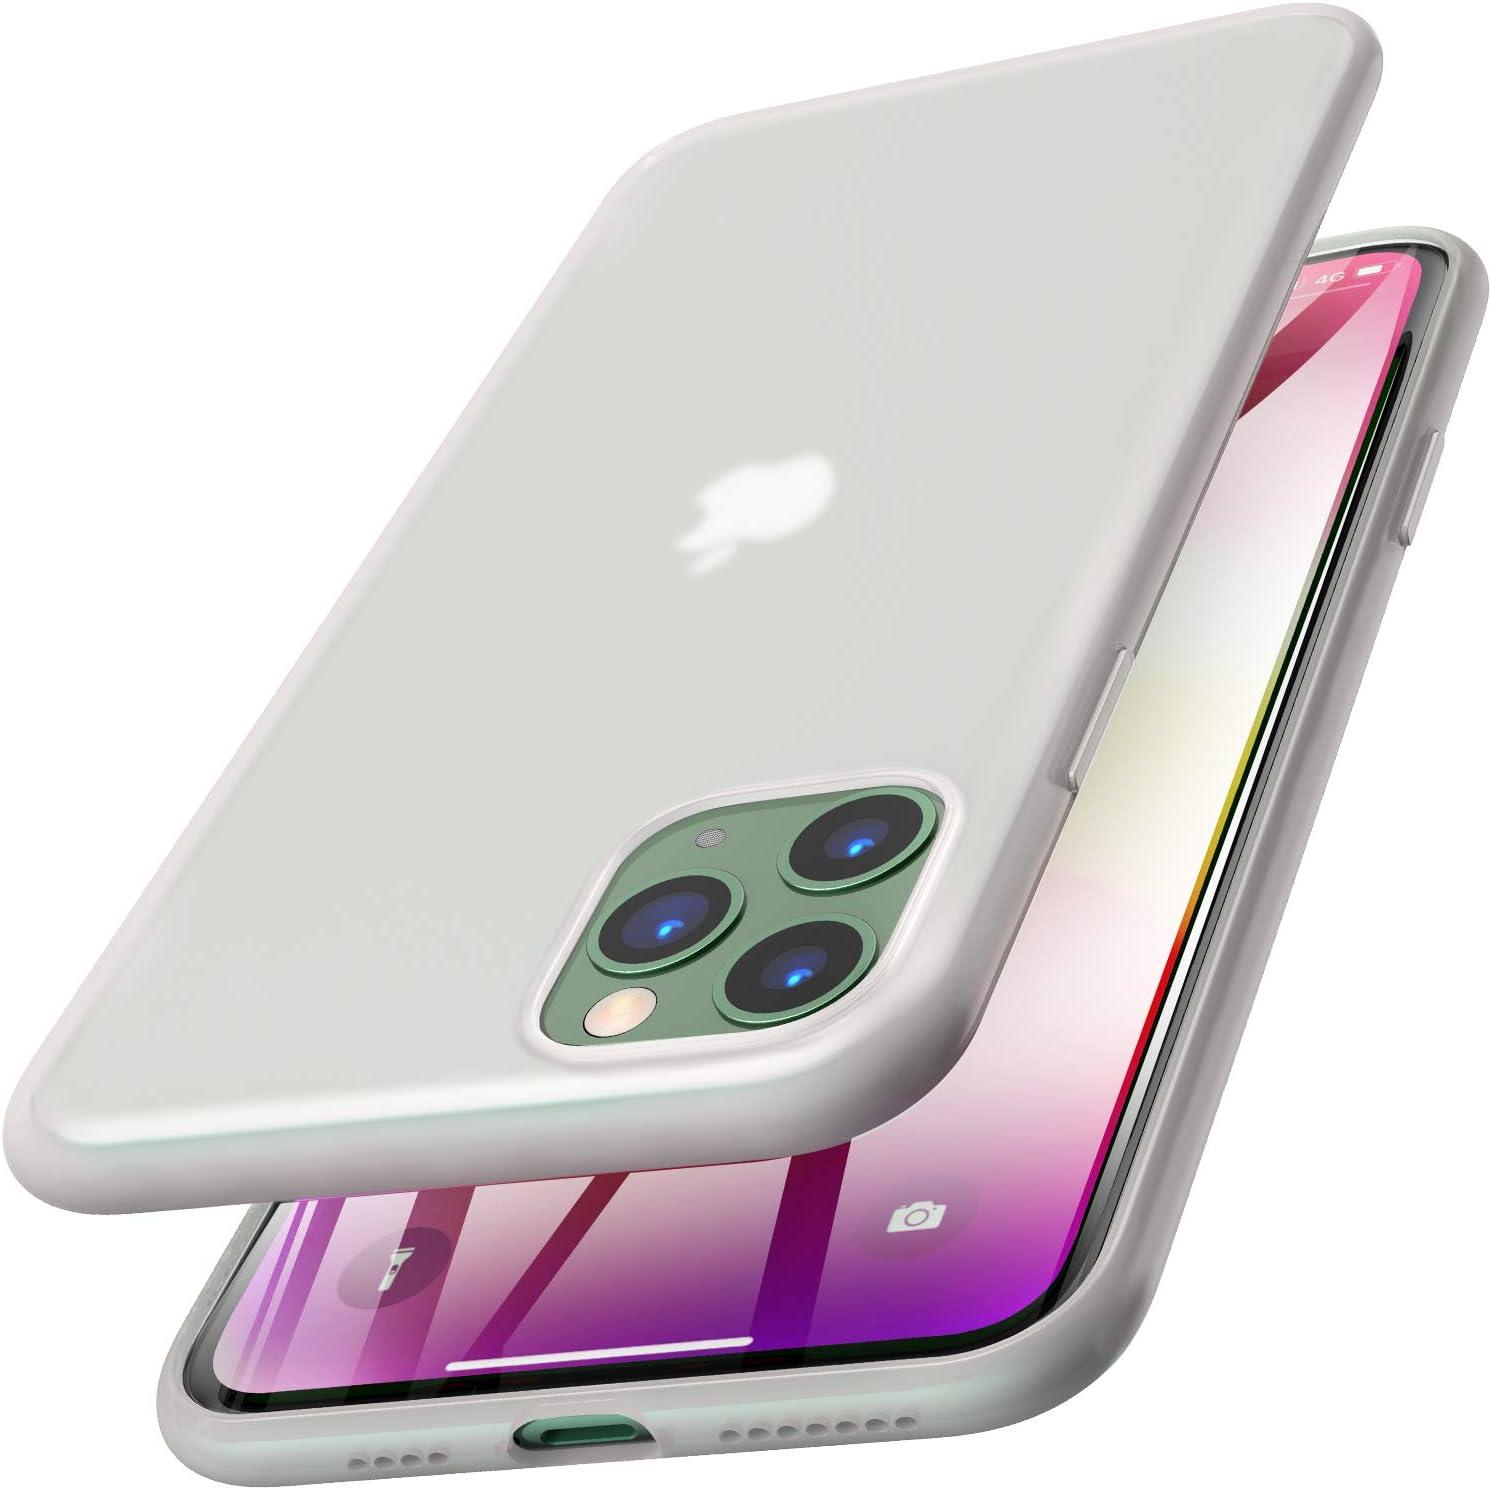 Tozo Für Iphone 11 Pro Max Hülle 6 5 Zoll Flüssiges Elektronik